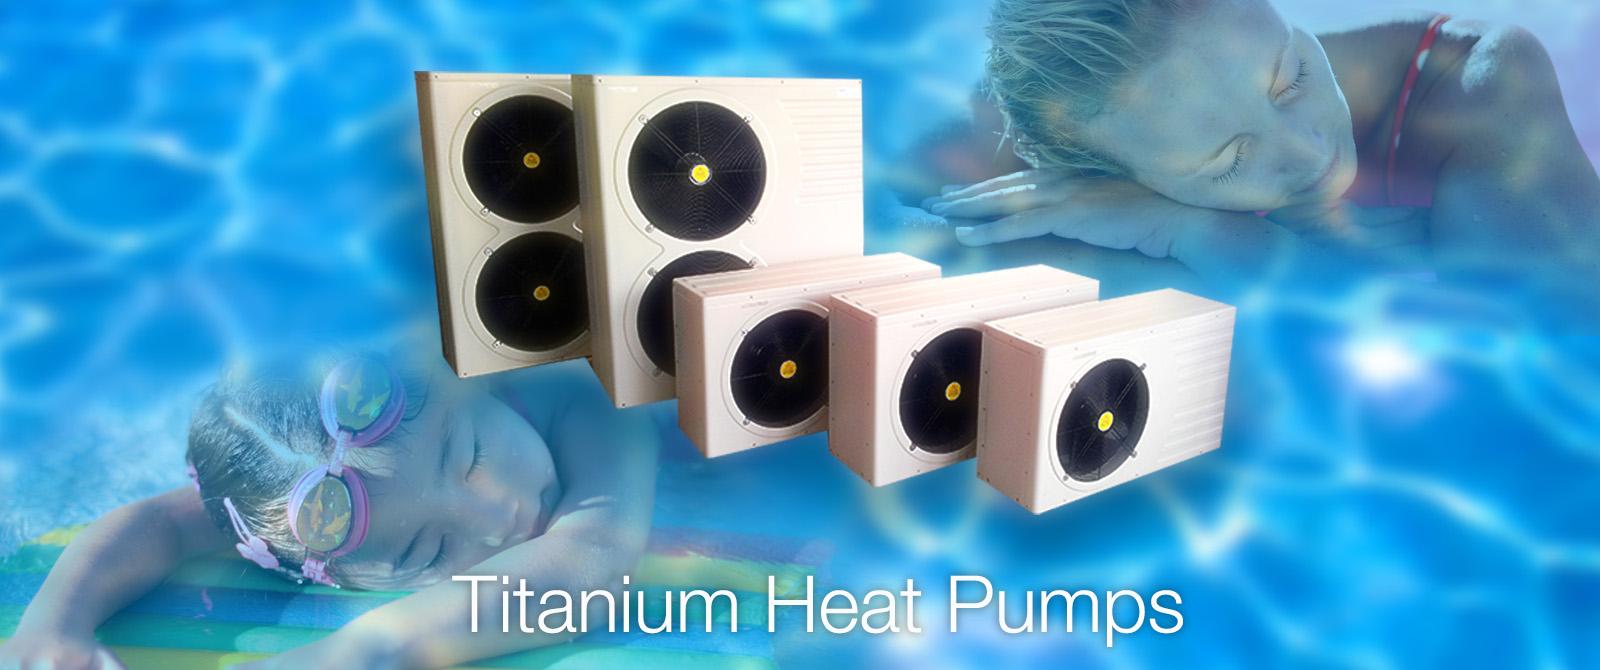 titanium heat pumps lanzarote